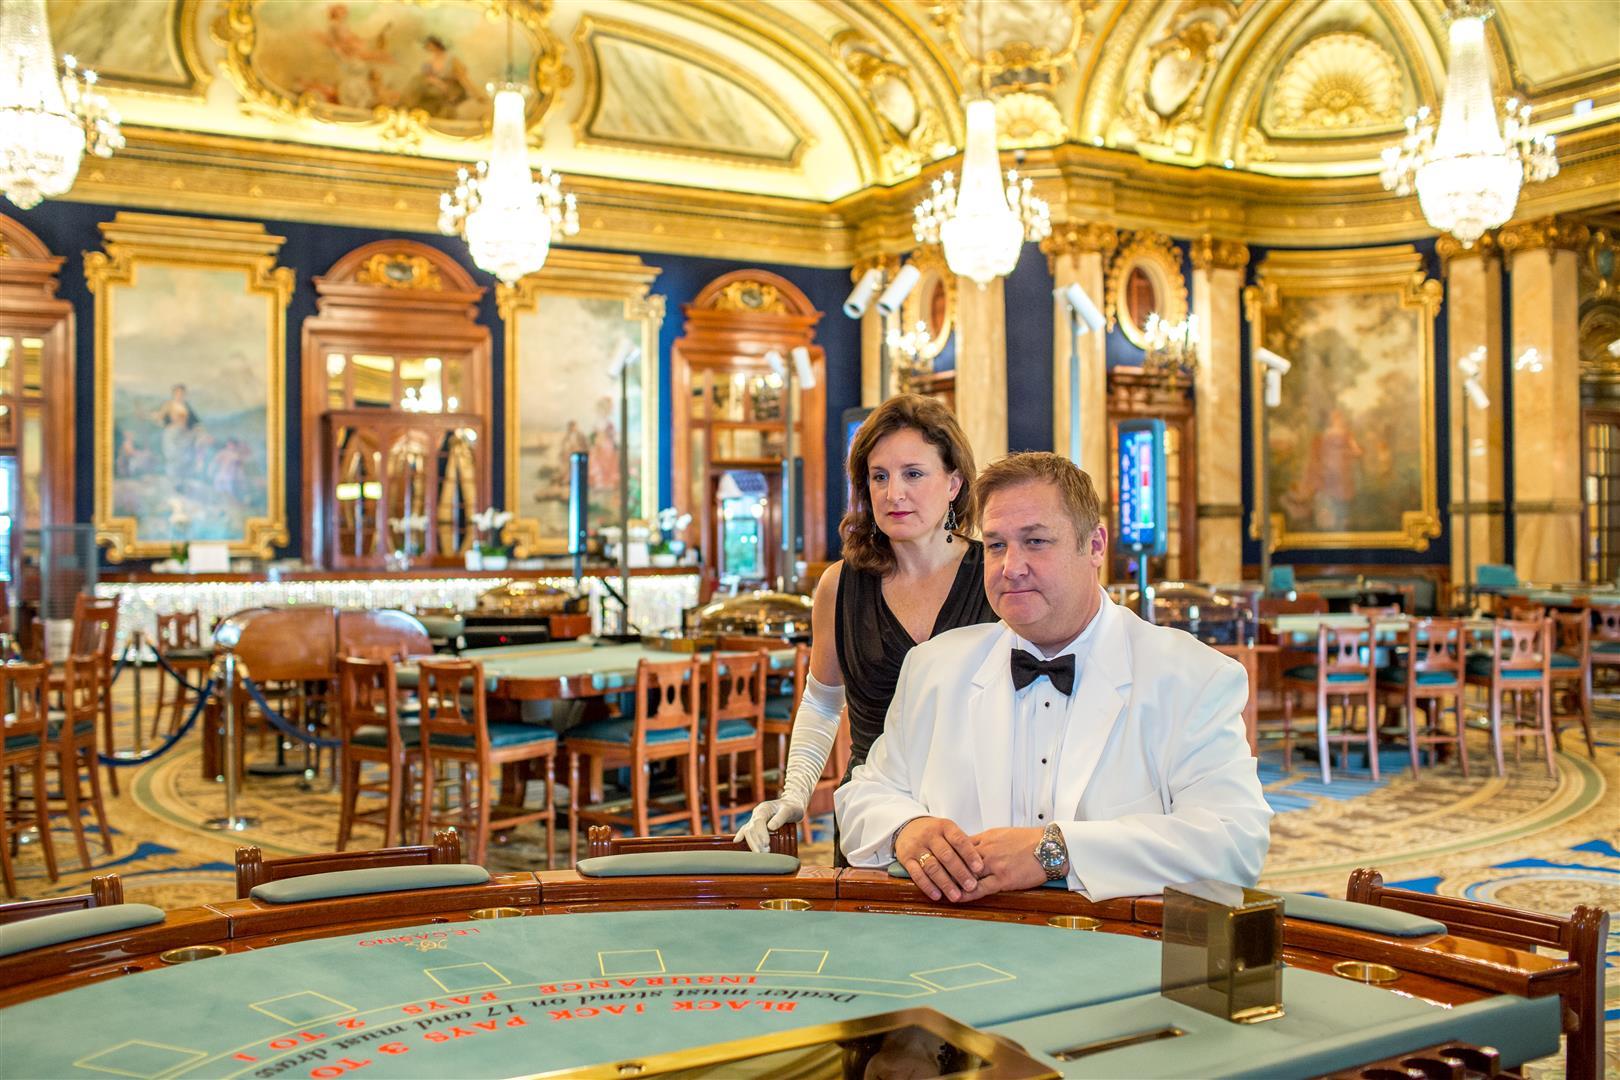 Bermuda casinos